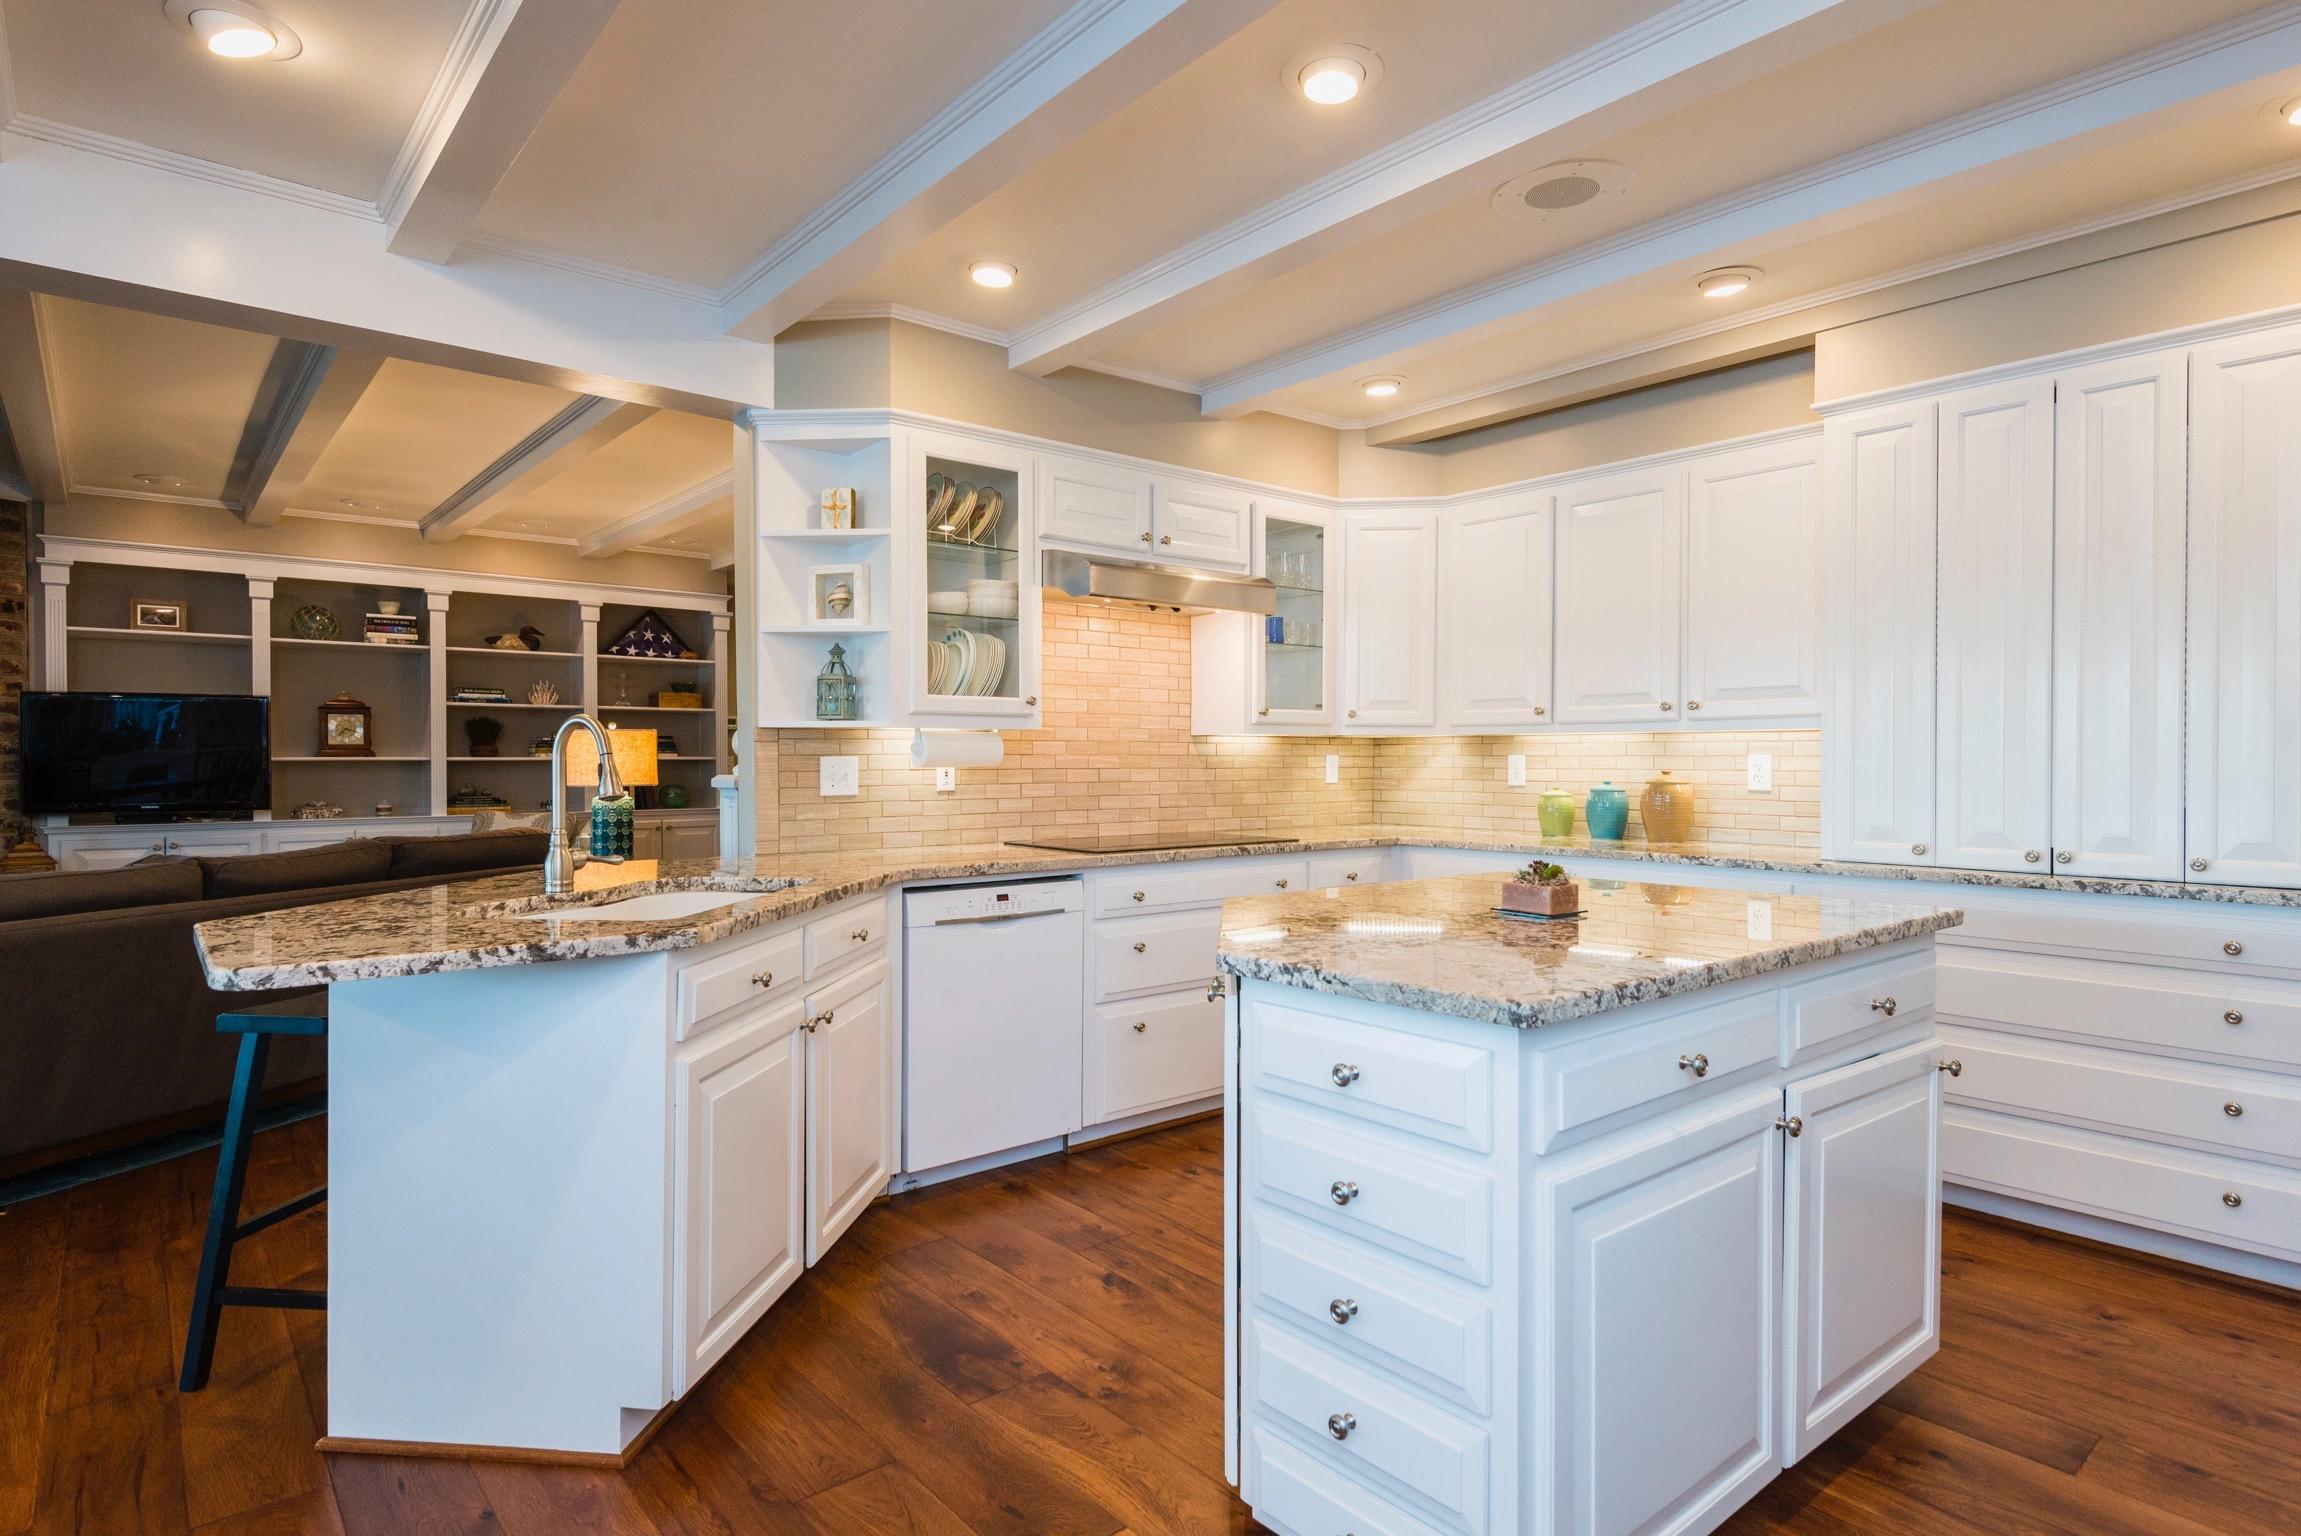 Lawton Bluff Homes For Sale - 685 Shore, Charleston, SC - 28